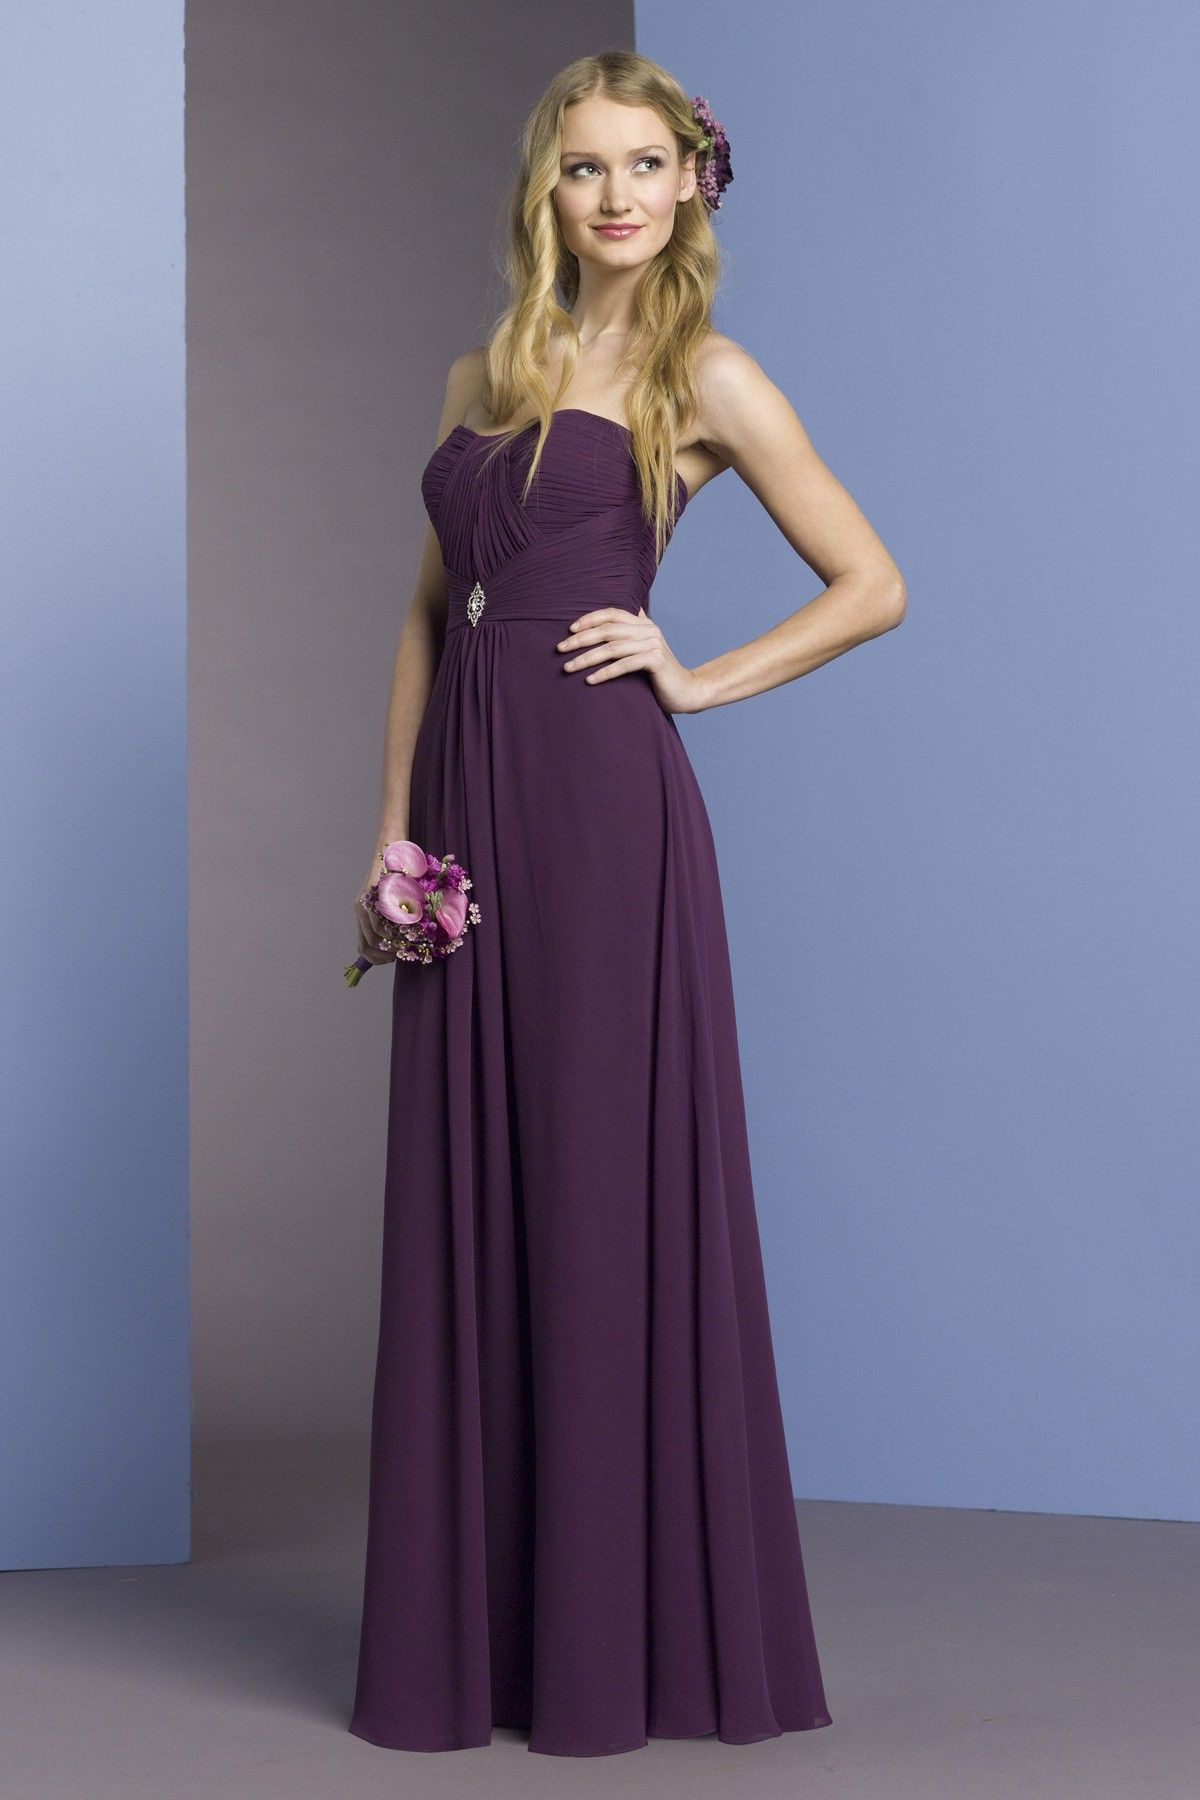 Strapless Aline chiffon bridesmaid dress 139.67 Purple